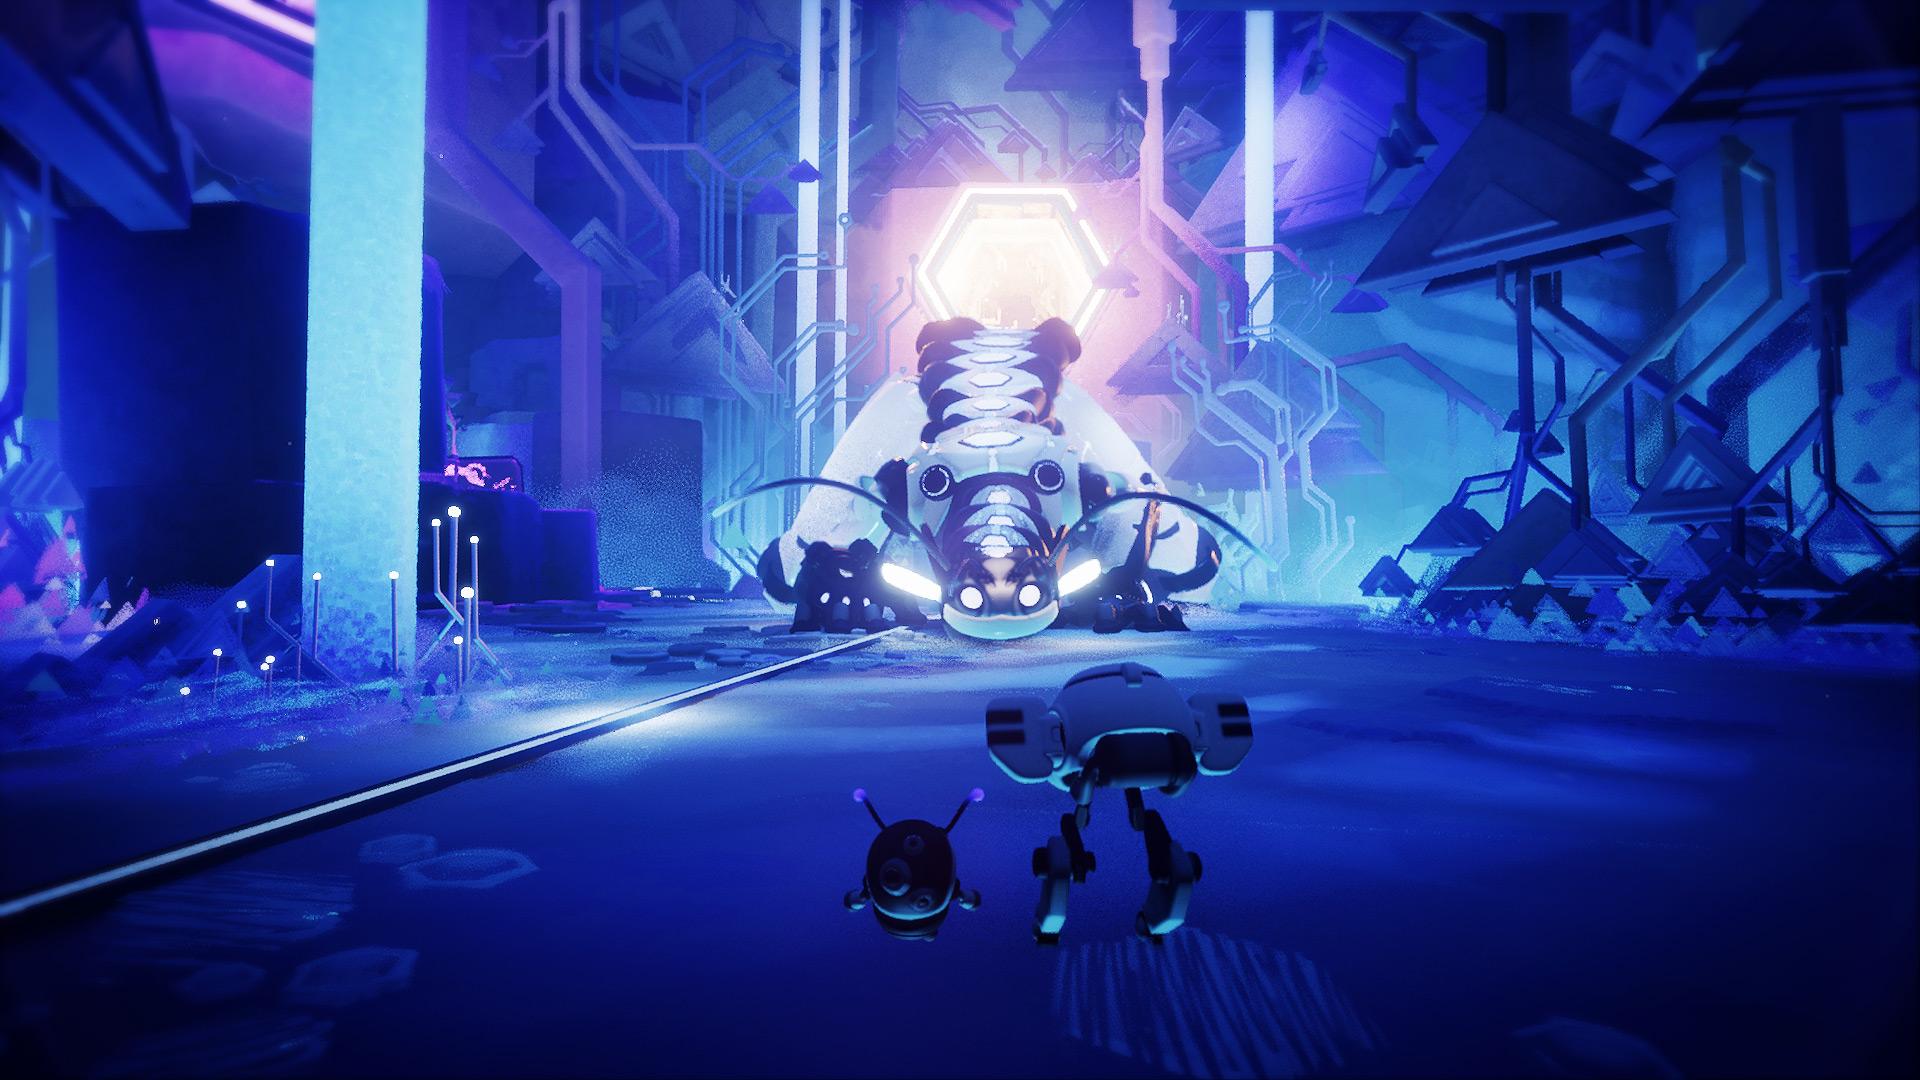 Media Molecule is bringing more players into the Dreams beta screenshot